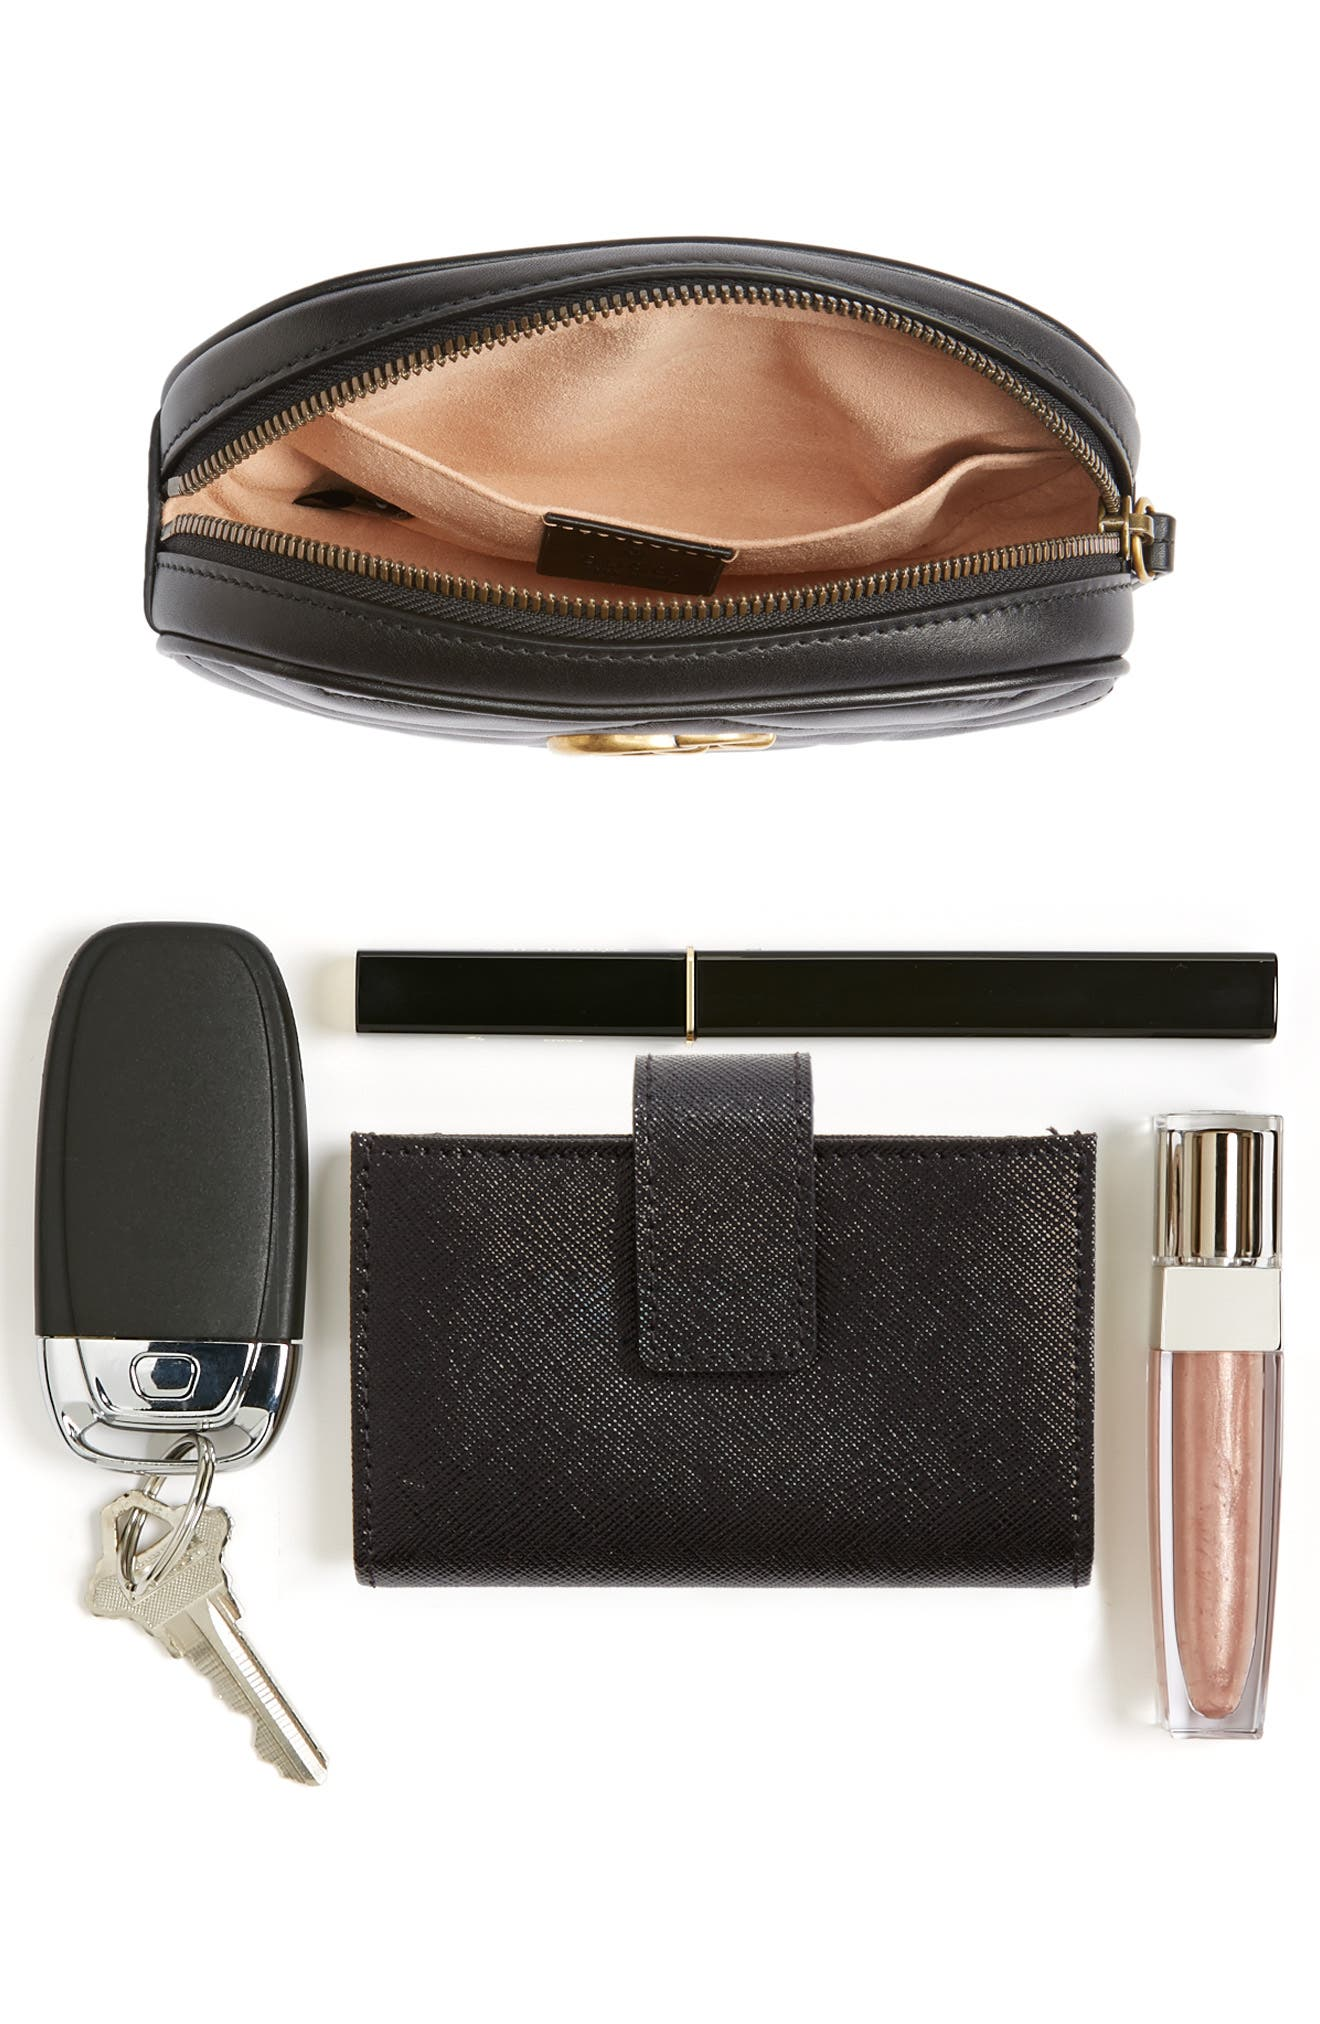 GG Marmont 2.0 Matelassé Leather Belt Bag,                             Alternate thumbnail 7, color,                             NERO